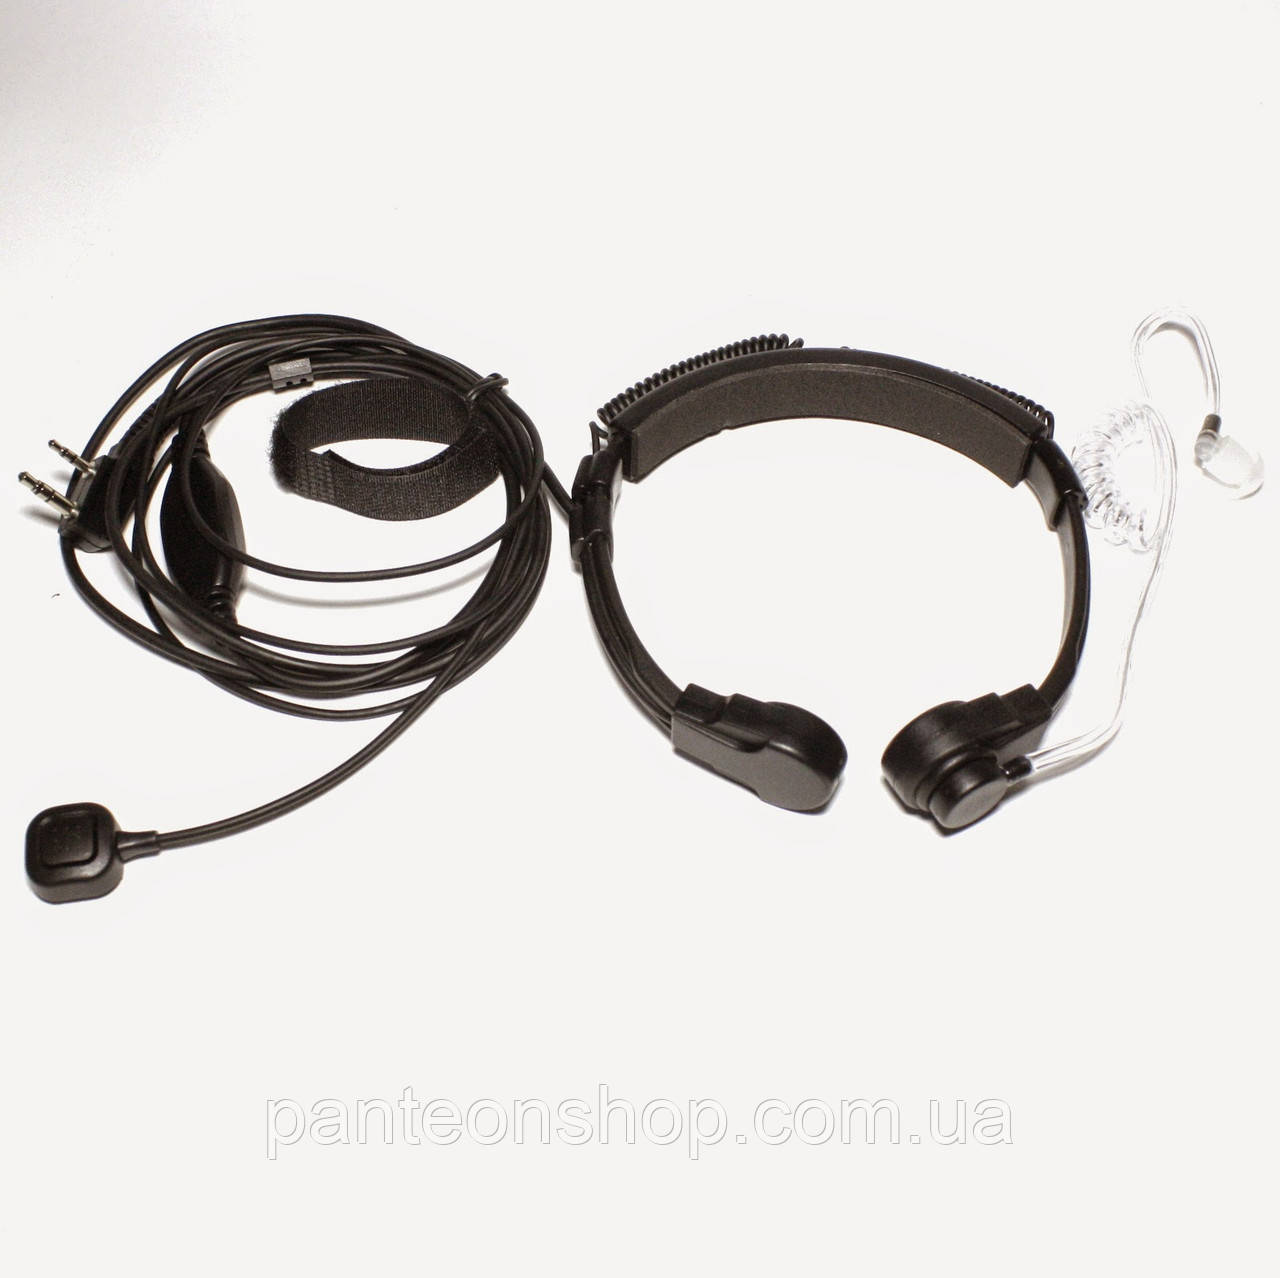 Гарнітура Kenwood-Baofeng ларингофон V2